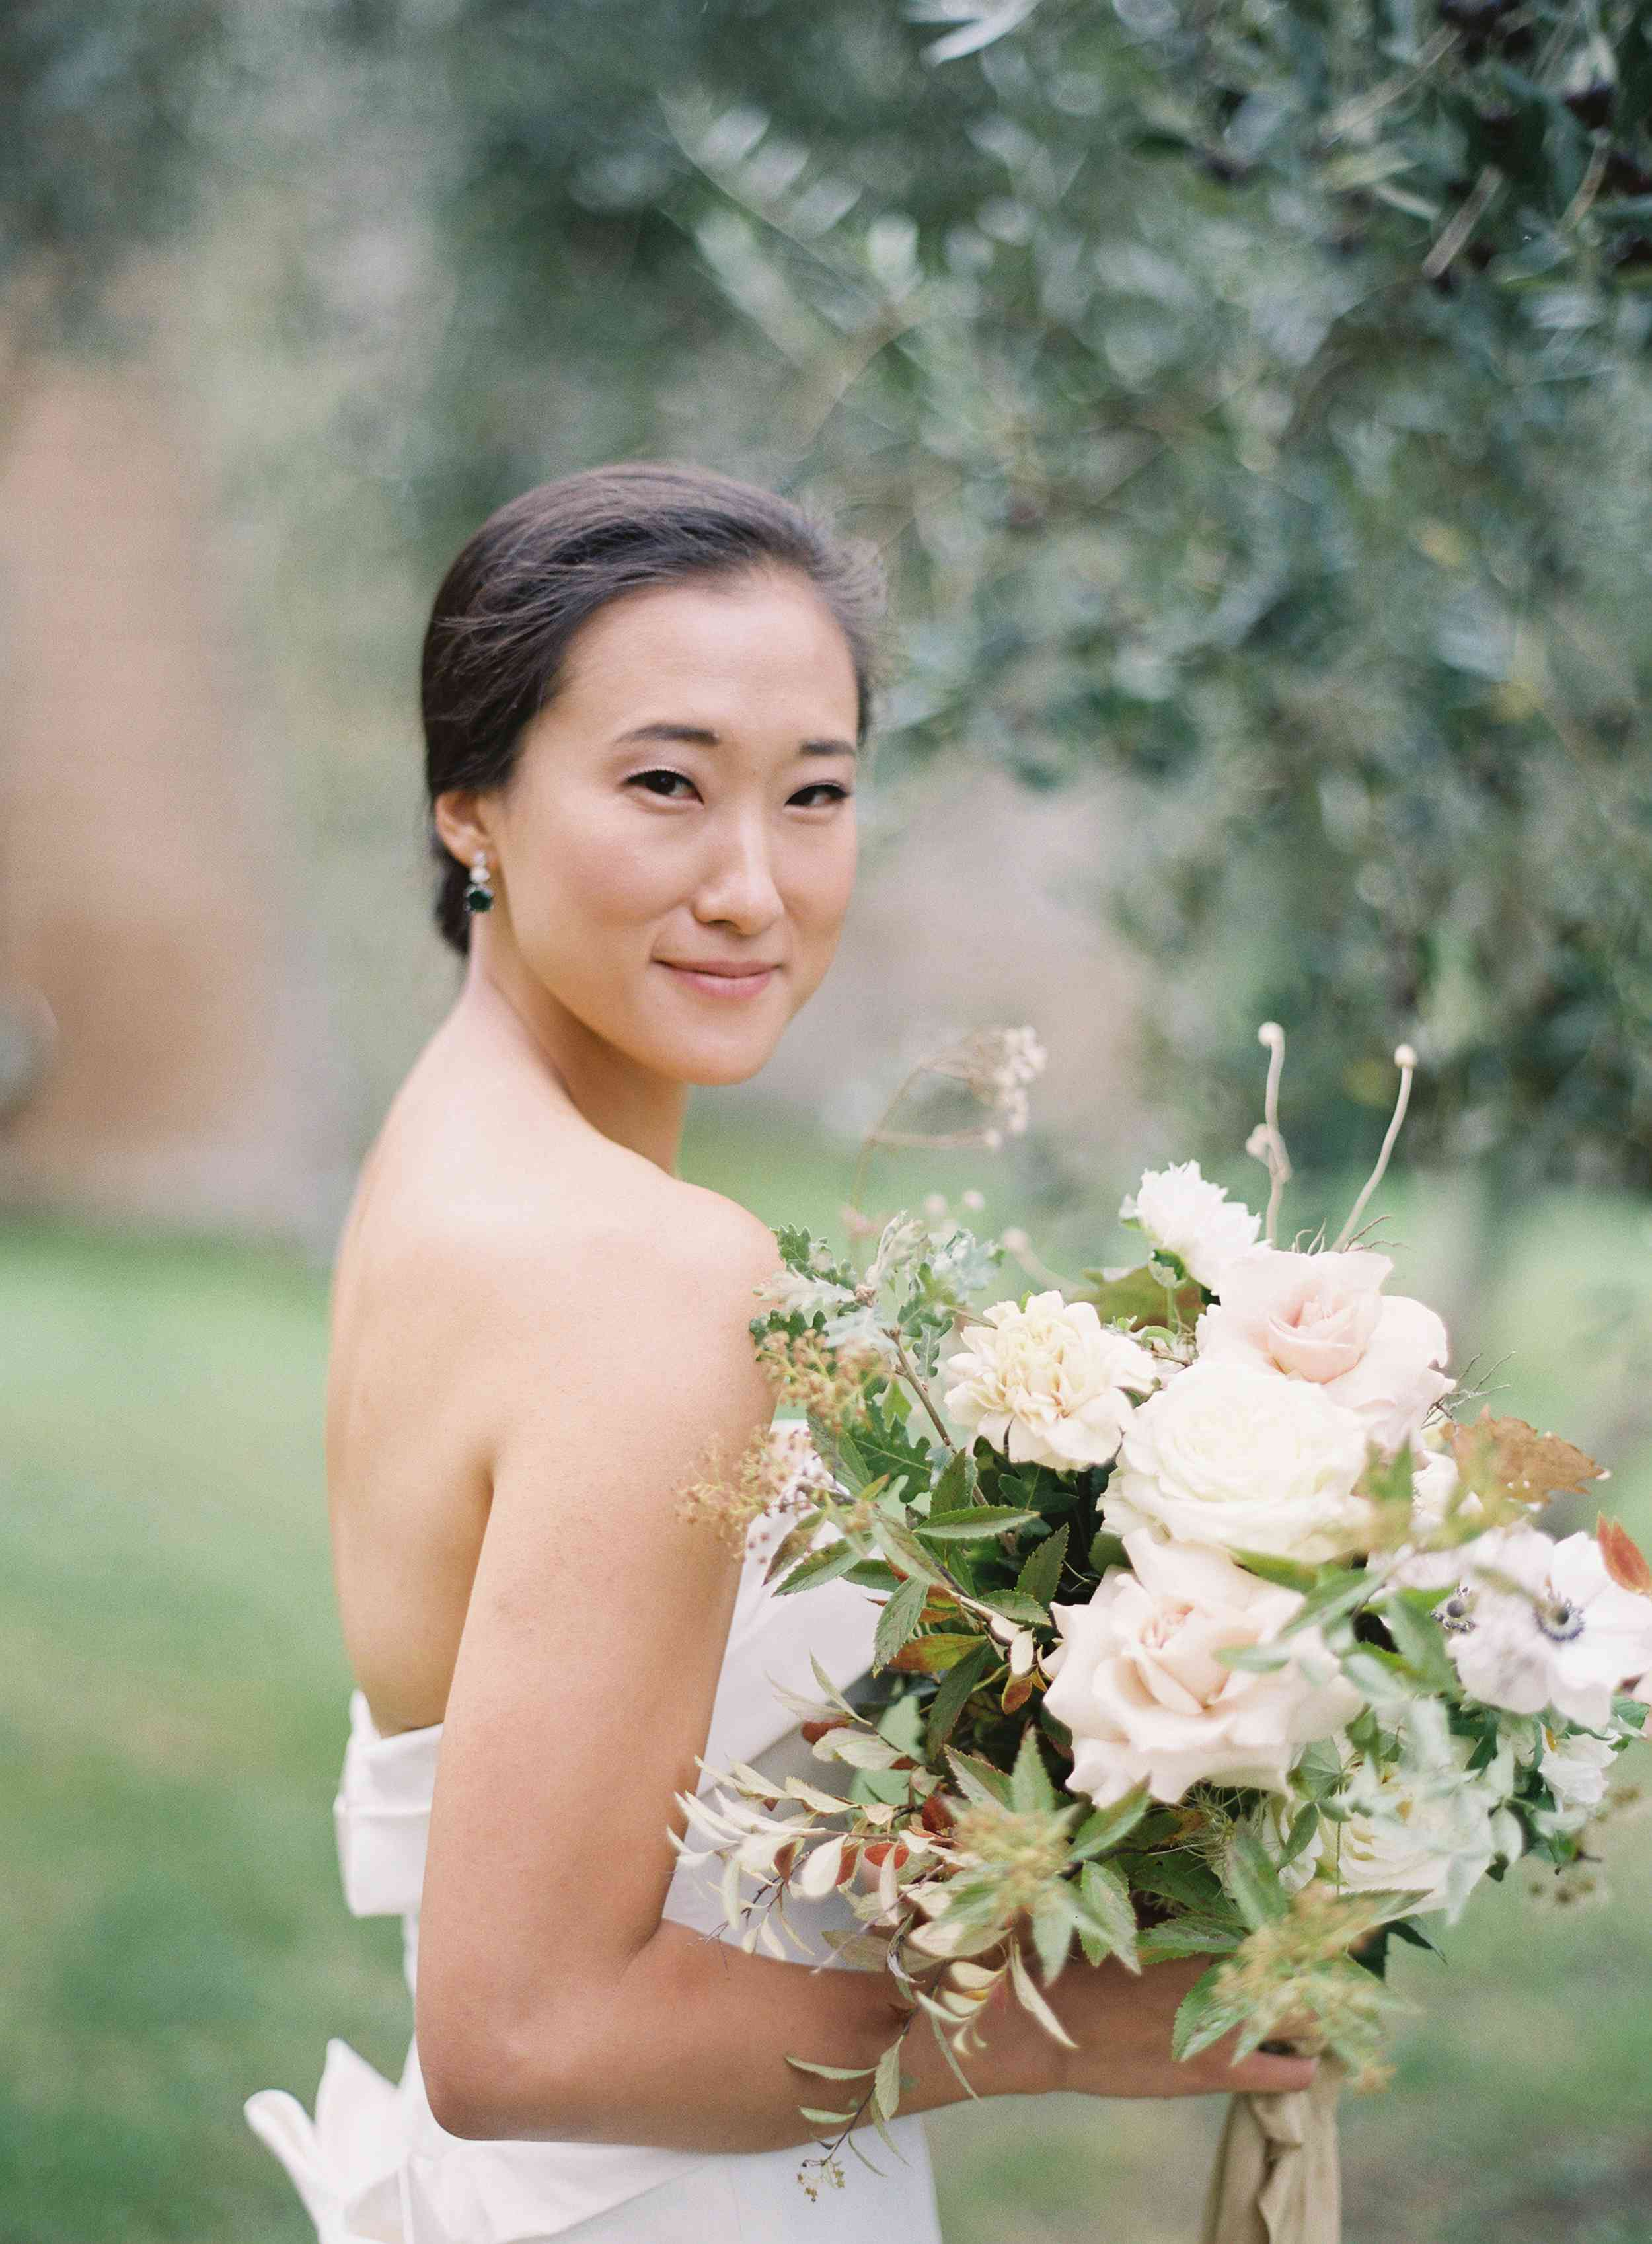 classic la badia italian wedding, bride holding bouquet